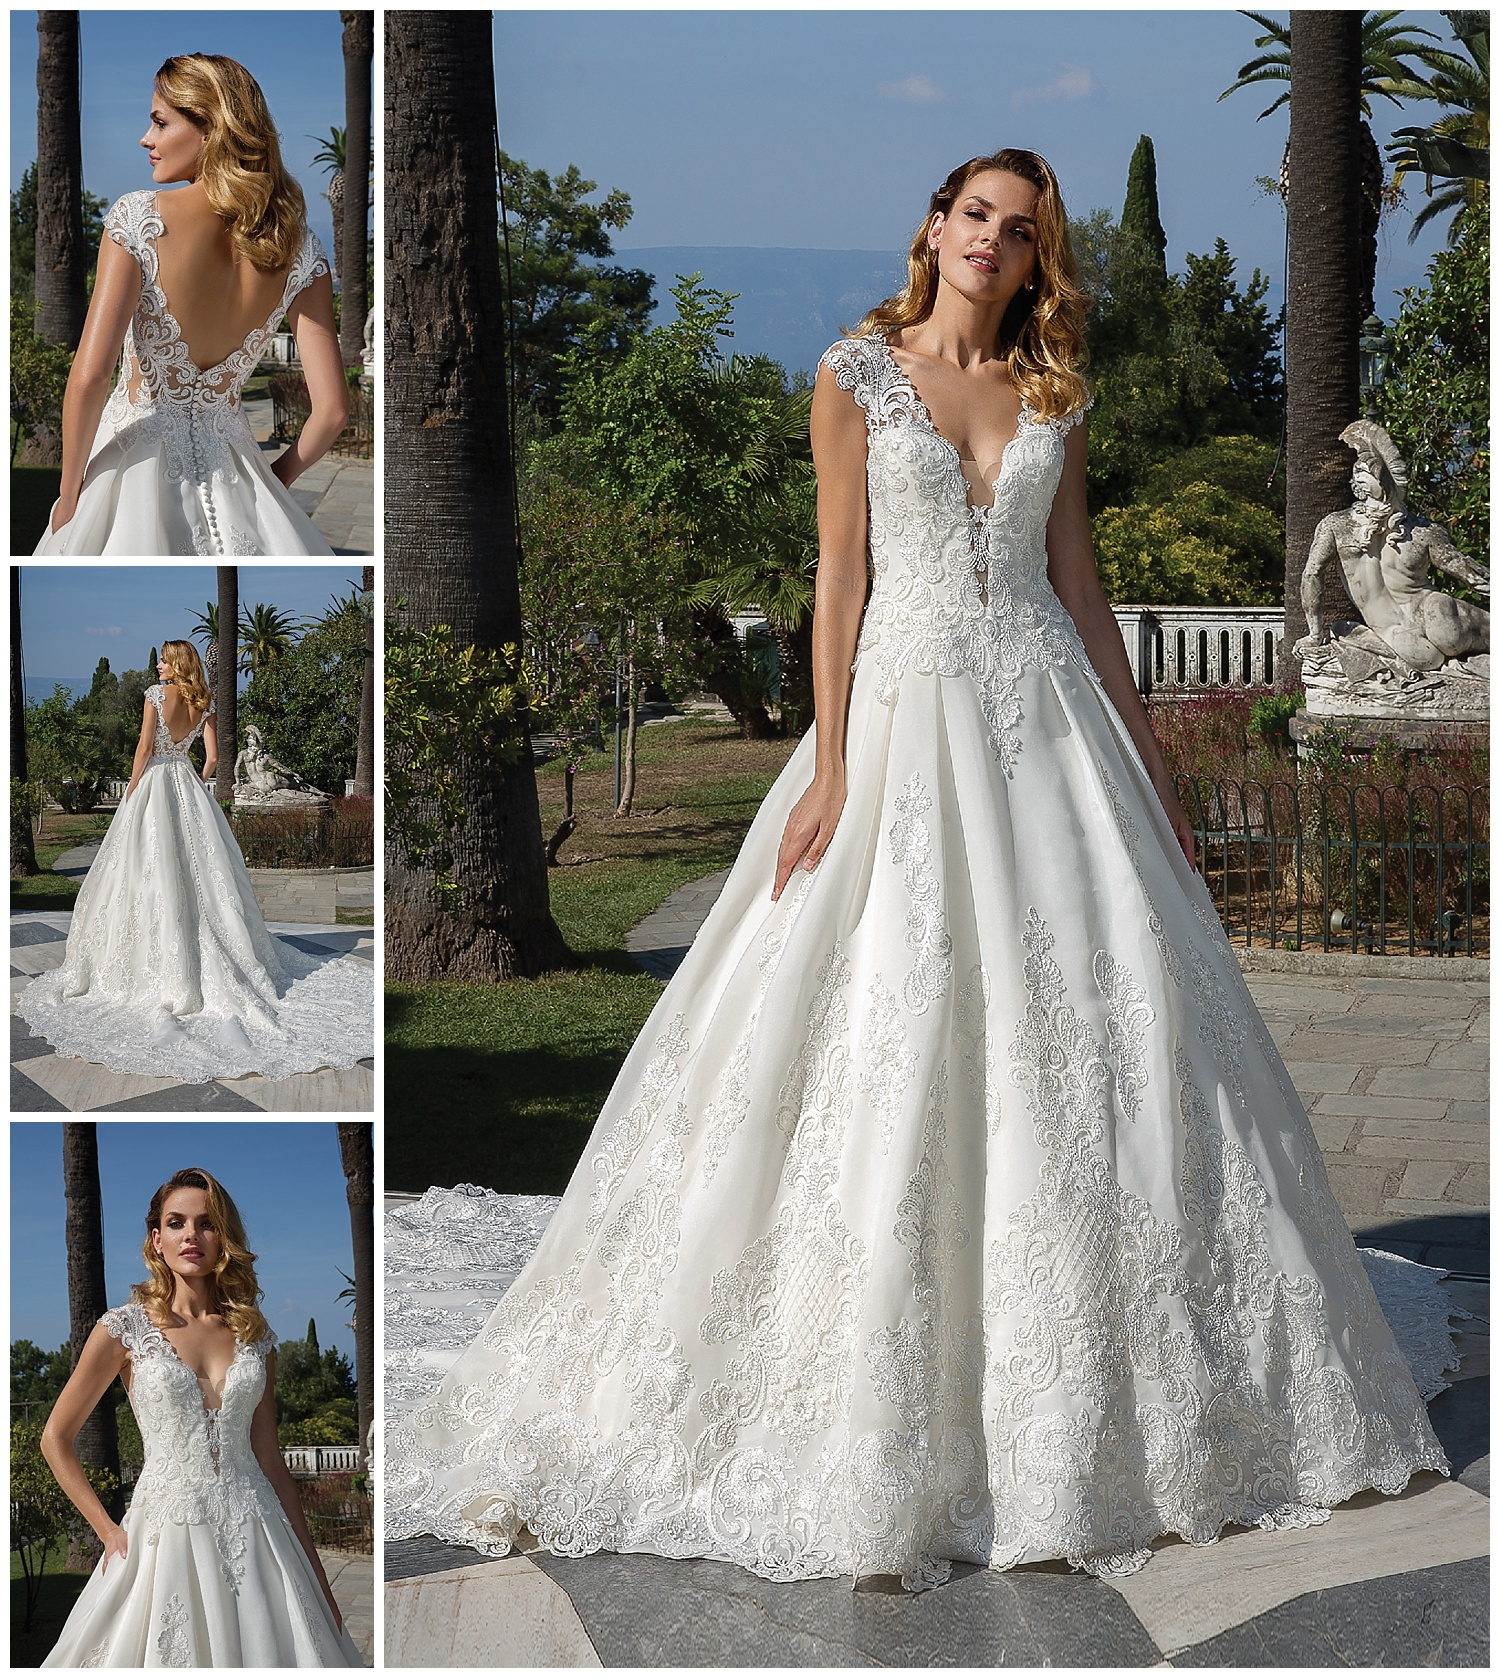 justin-alexander-88096-ballgown-wedding-dress-epiphany-boutique-carmel-california.jpg